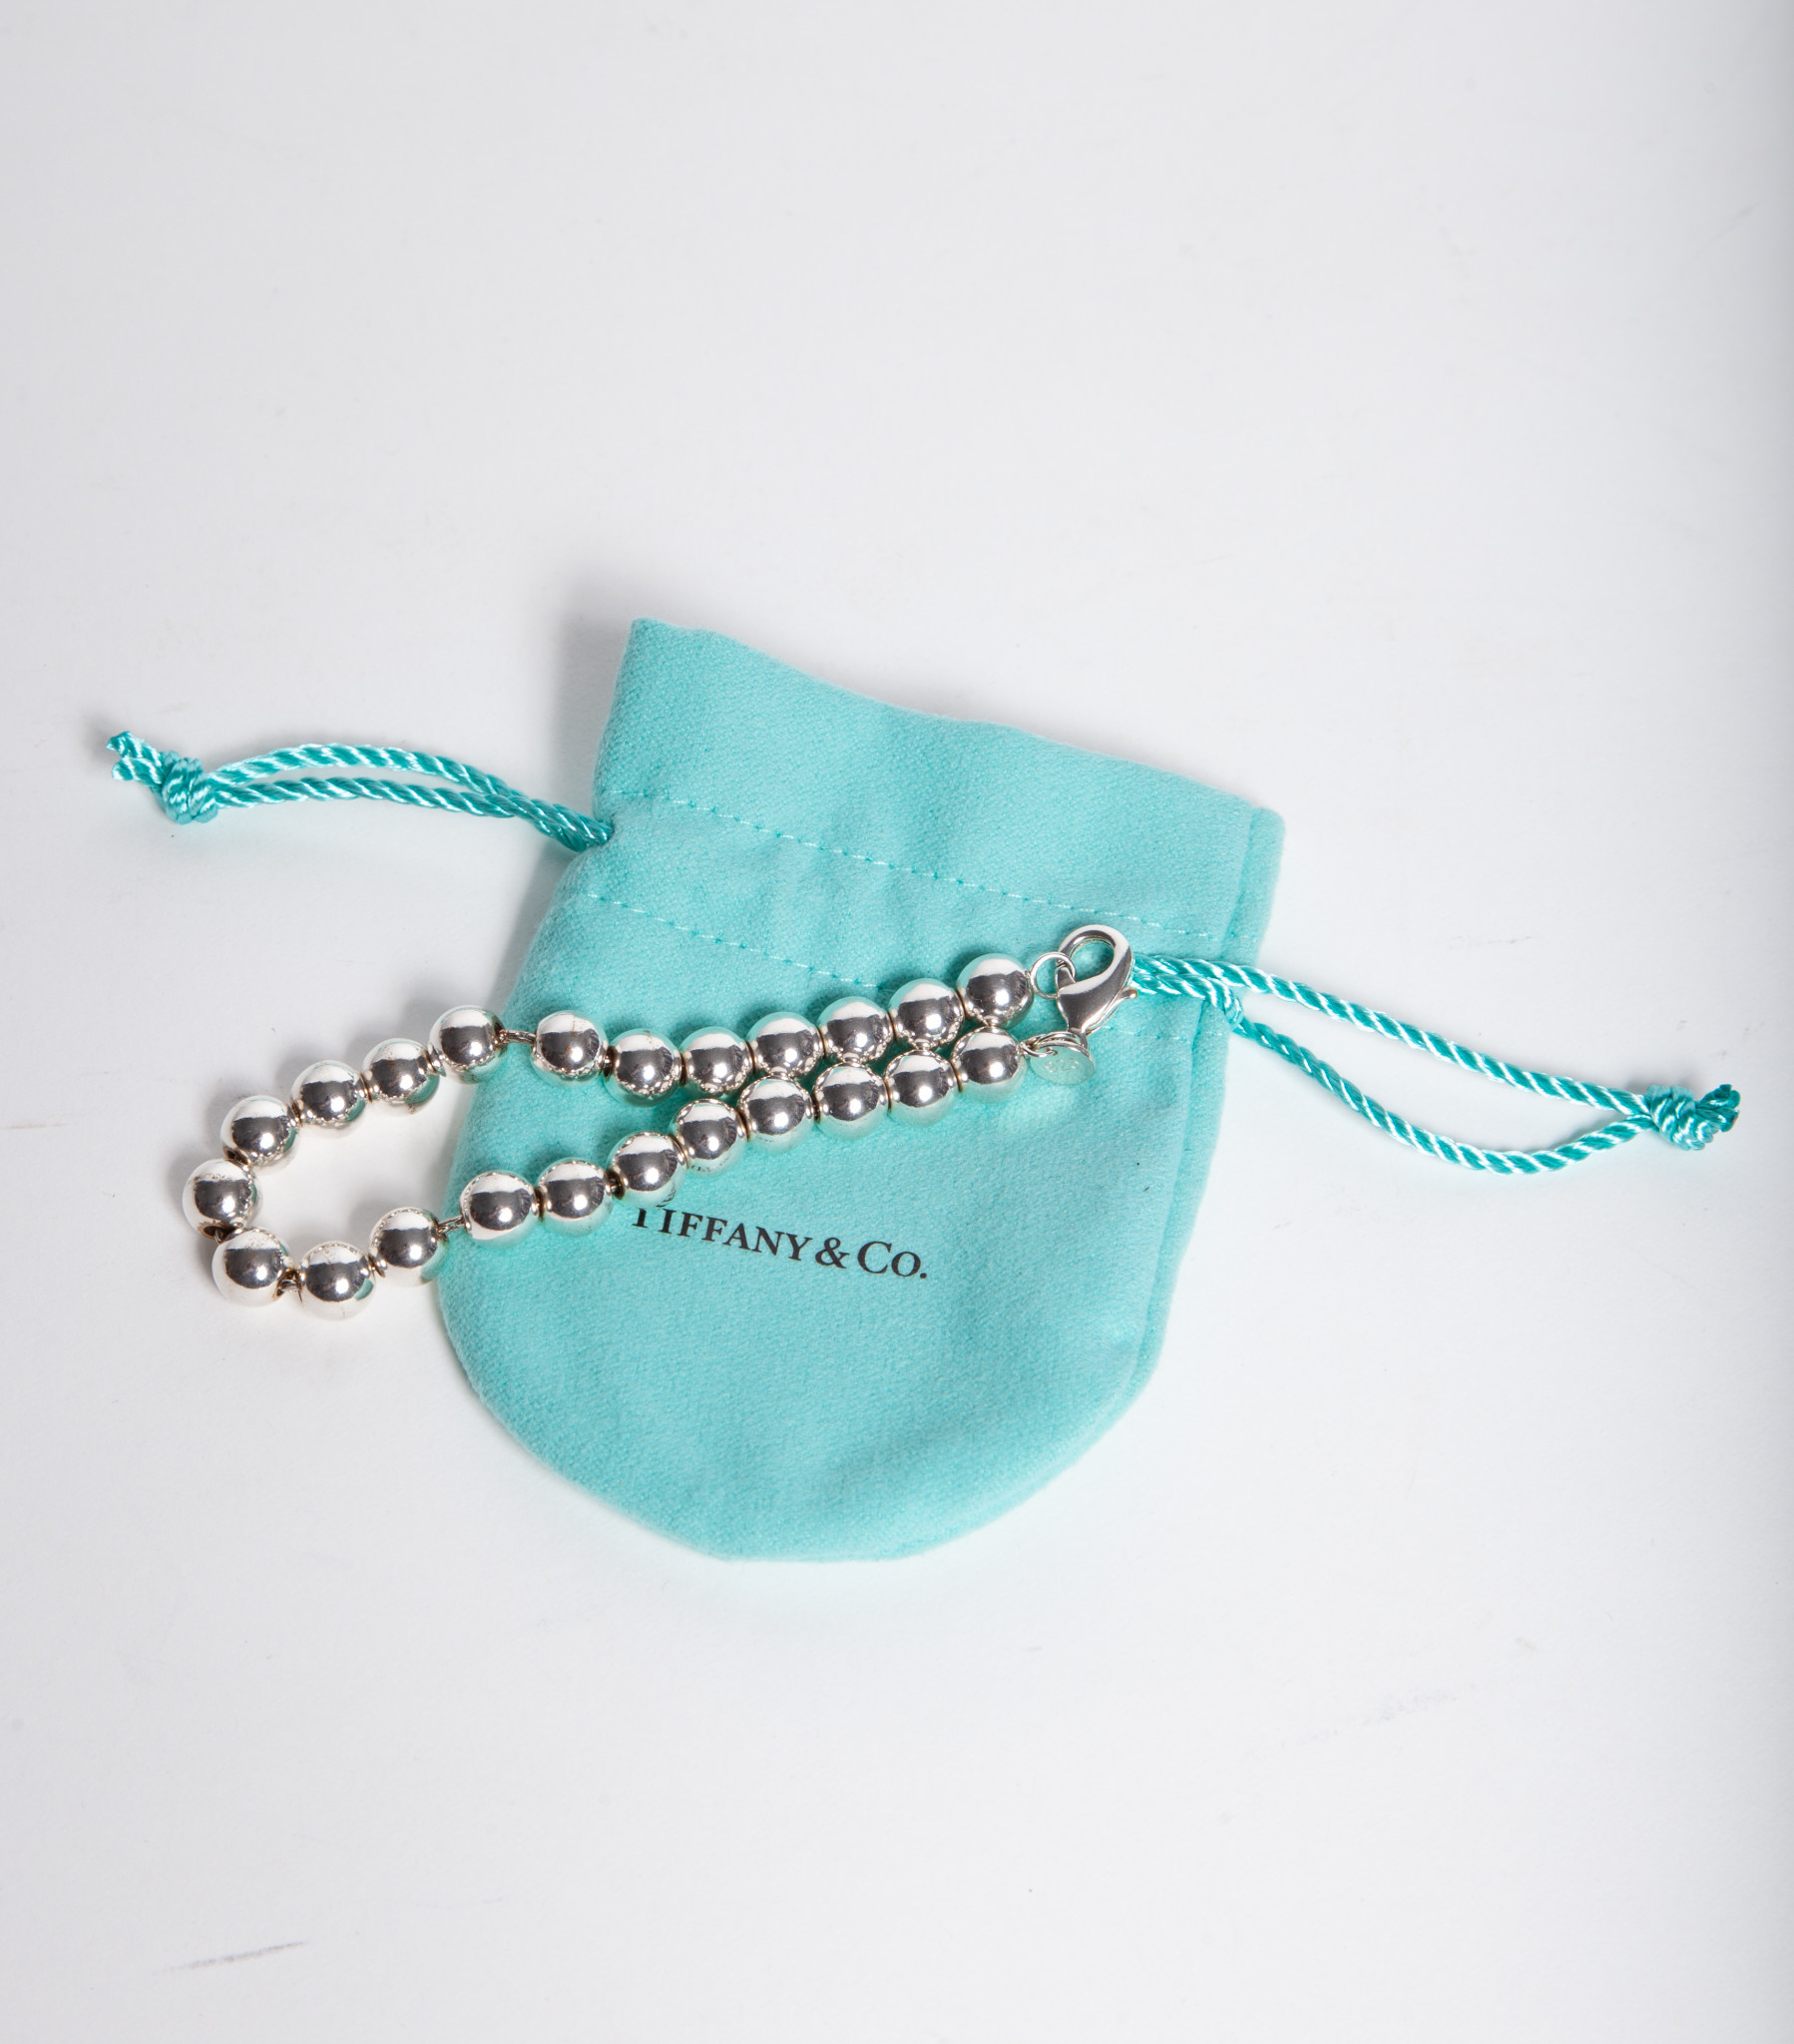 Tiffany & Co. BRACELET EN ARGENT